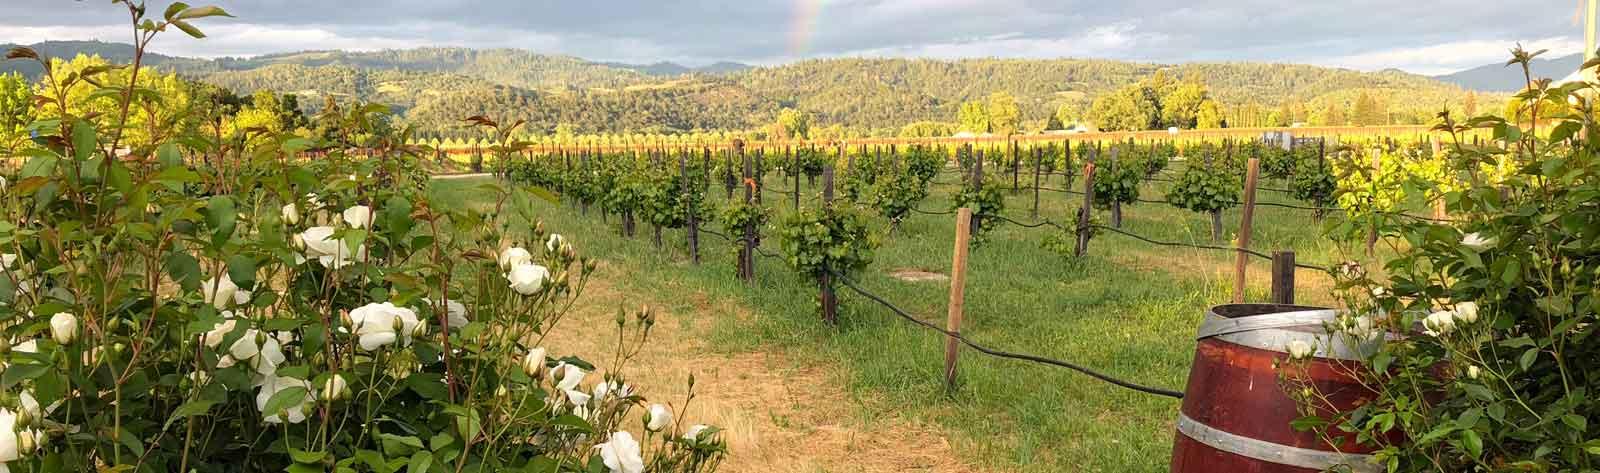 San Jose To Napa Wine Tour